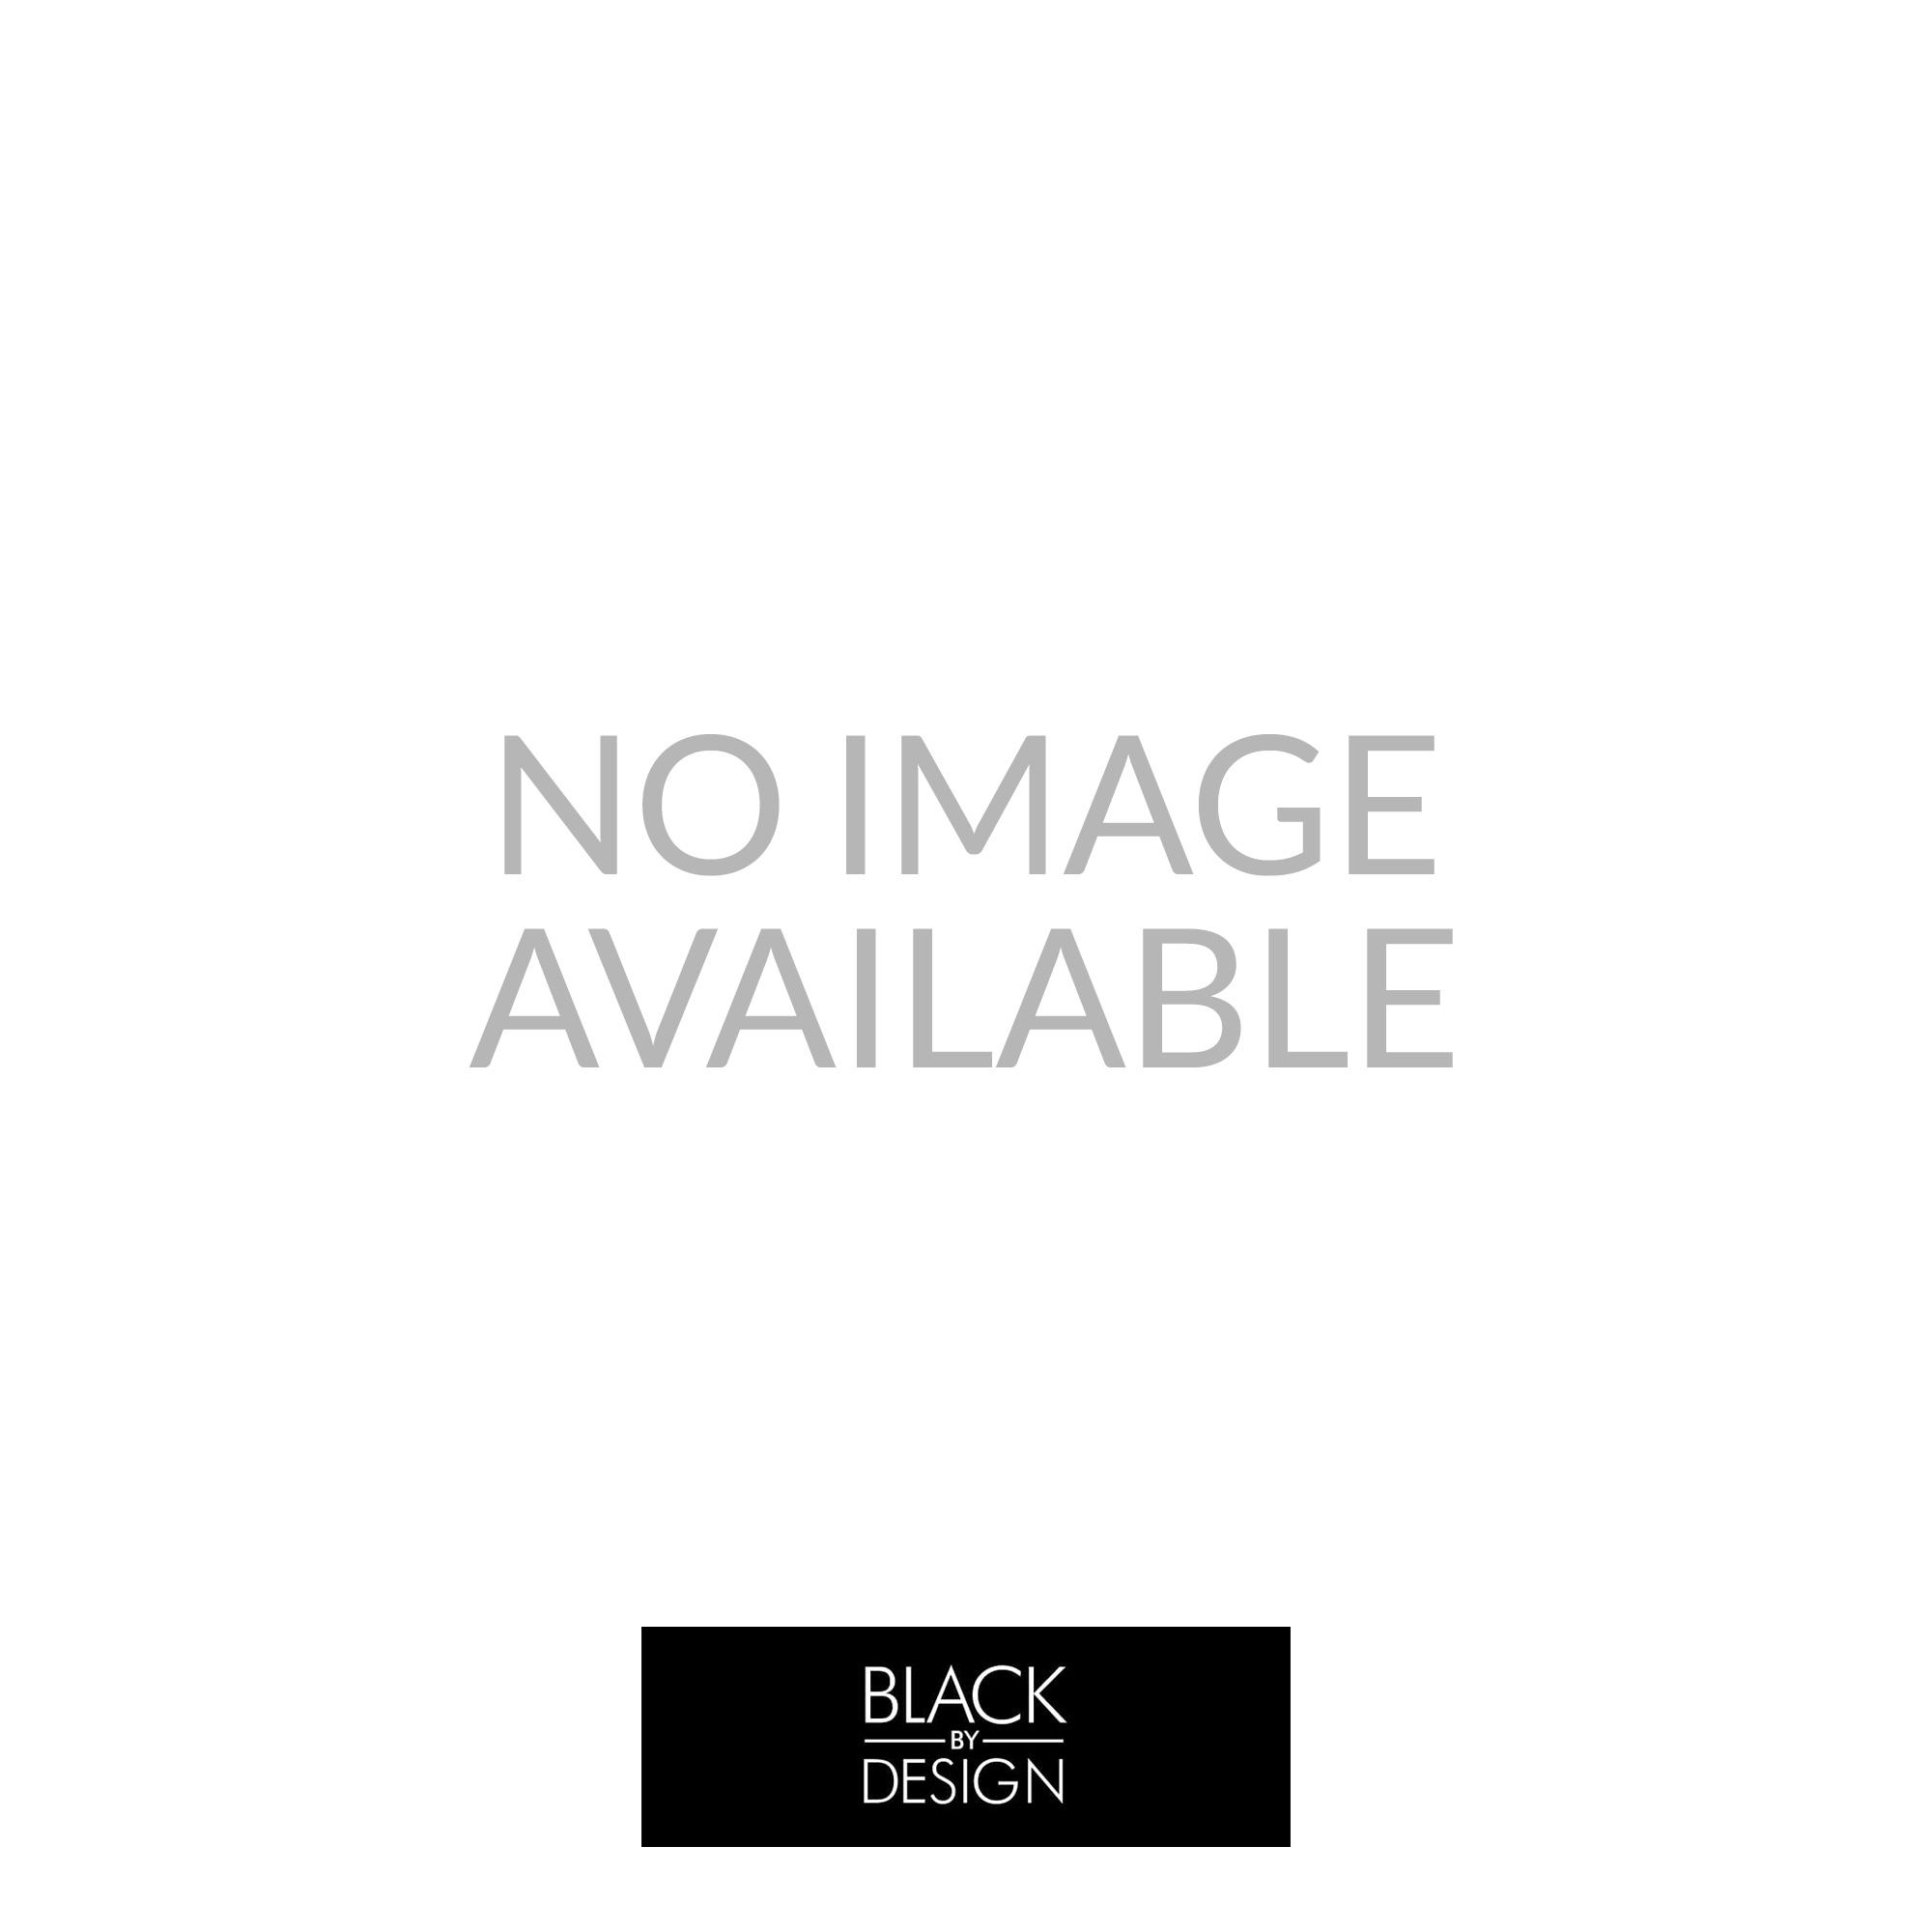 Menu 7L Bathroom Pedal Bin Black Black by Design